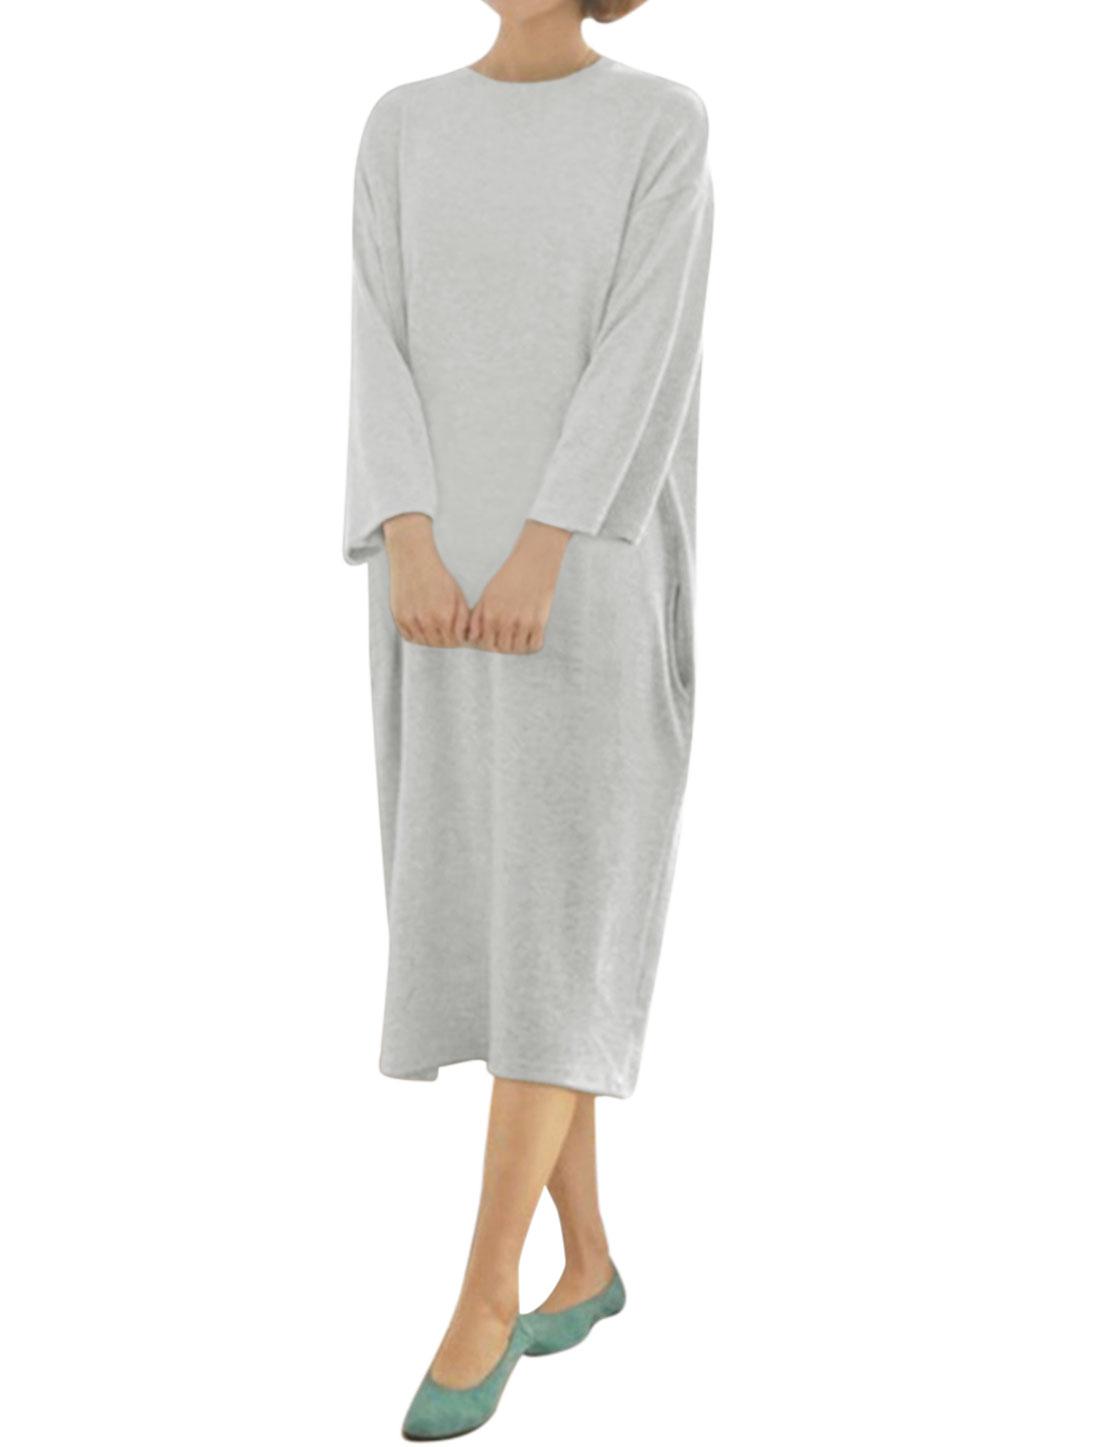 Women Round Neck Long Sleeves Two Pockets Loose Midi Dress Light Gray M